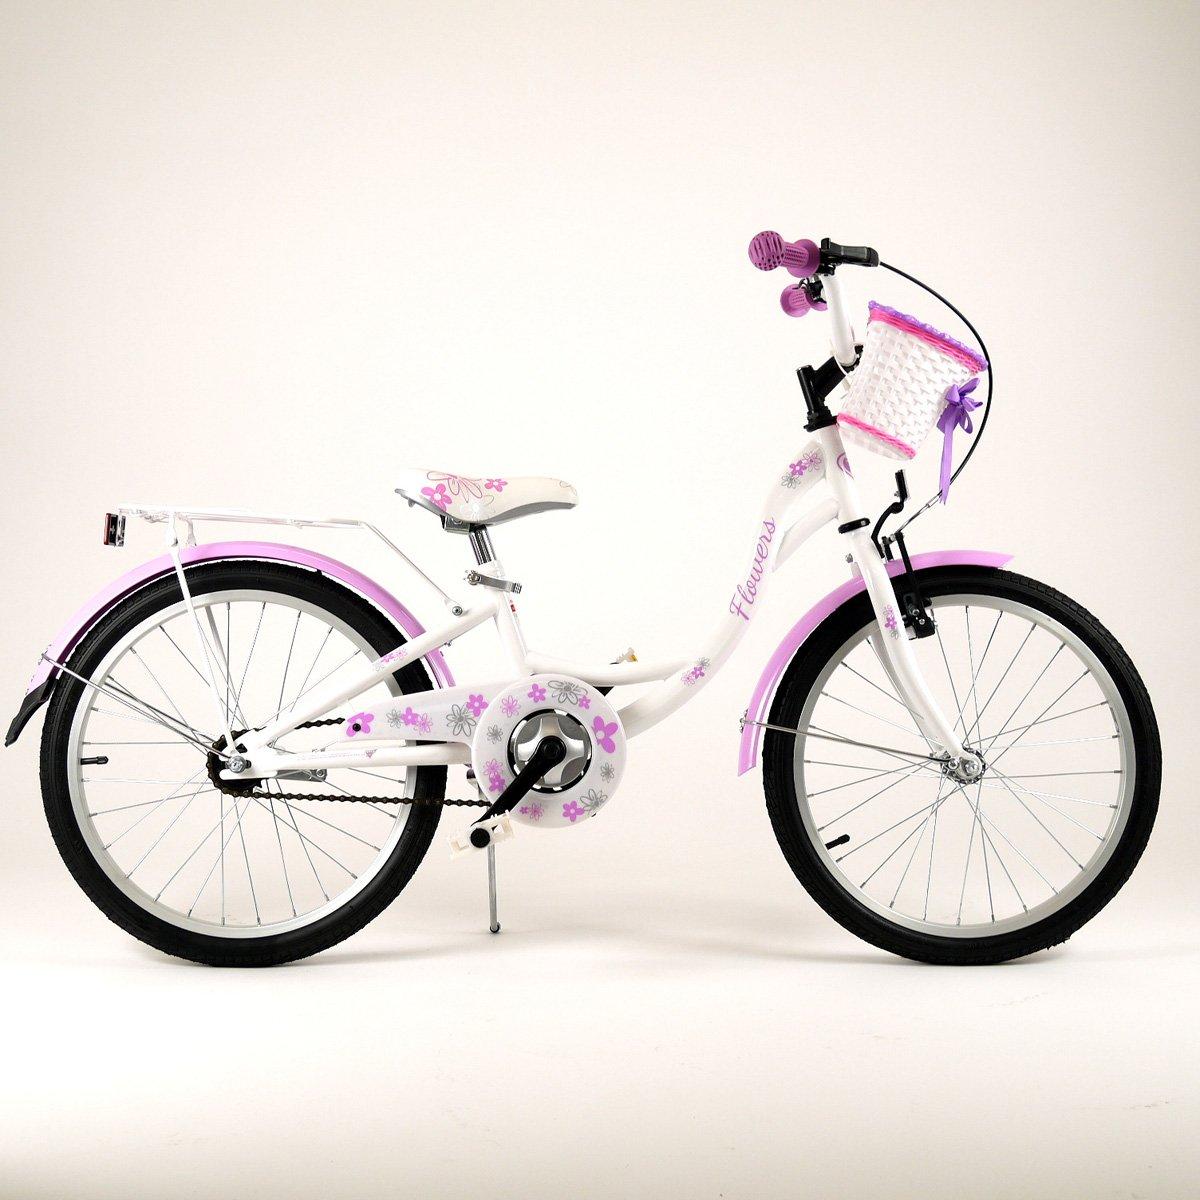 "20FLO-ROS Kinderfahrrad 20"" Zoll Kinderrad Fahrrad Rad Bike Spielrad Kinder"